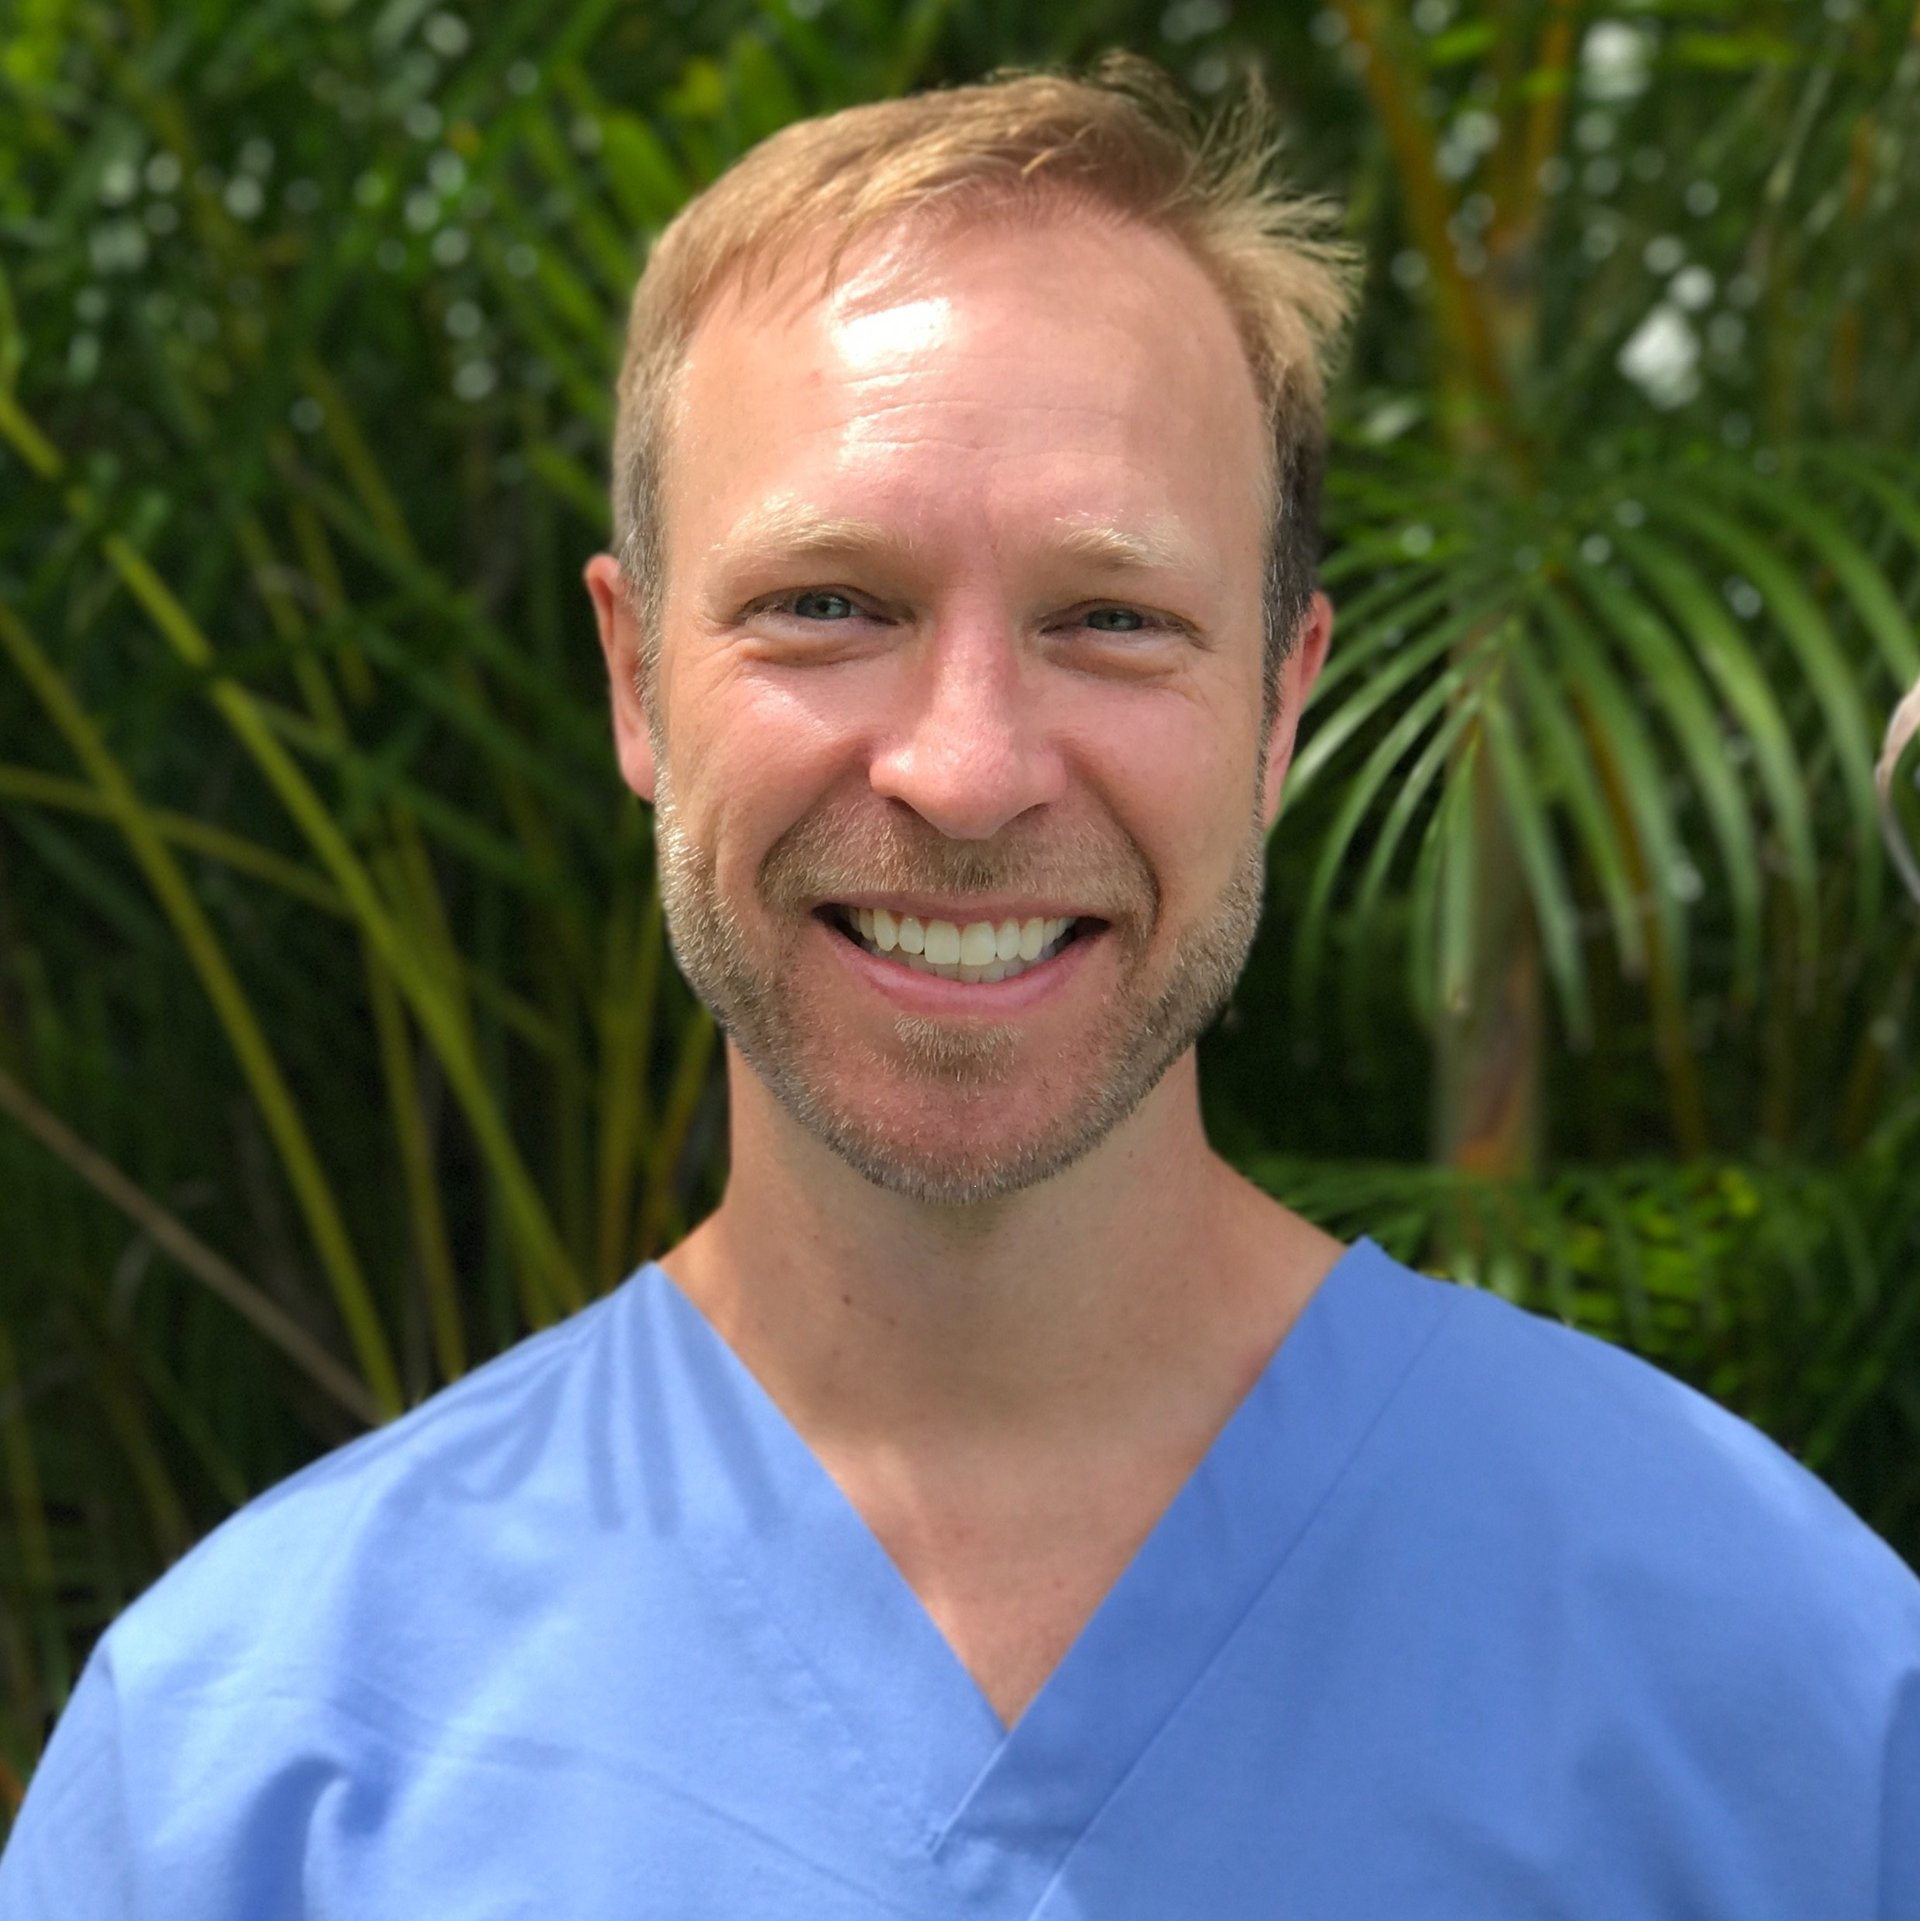 Dr. Erik Dunkelberger, dental professional in Kailua, HI